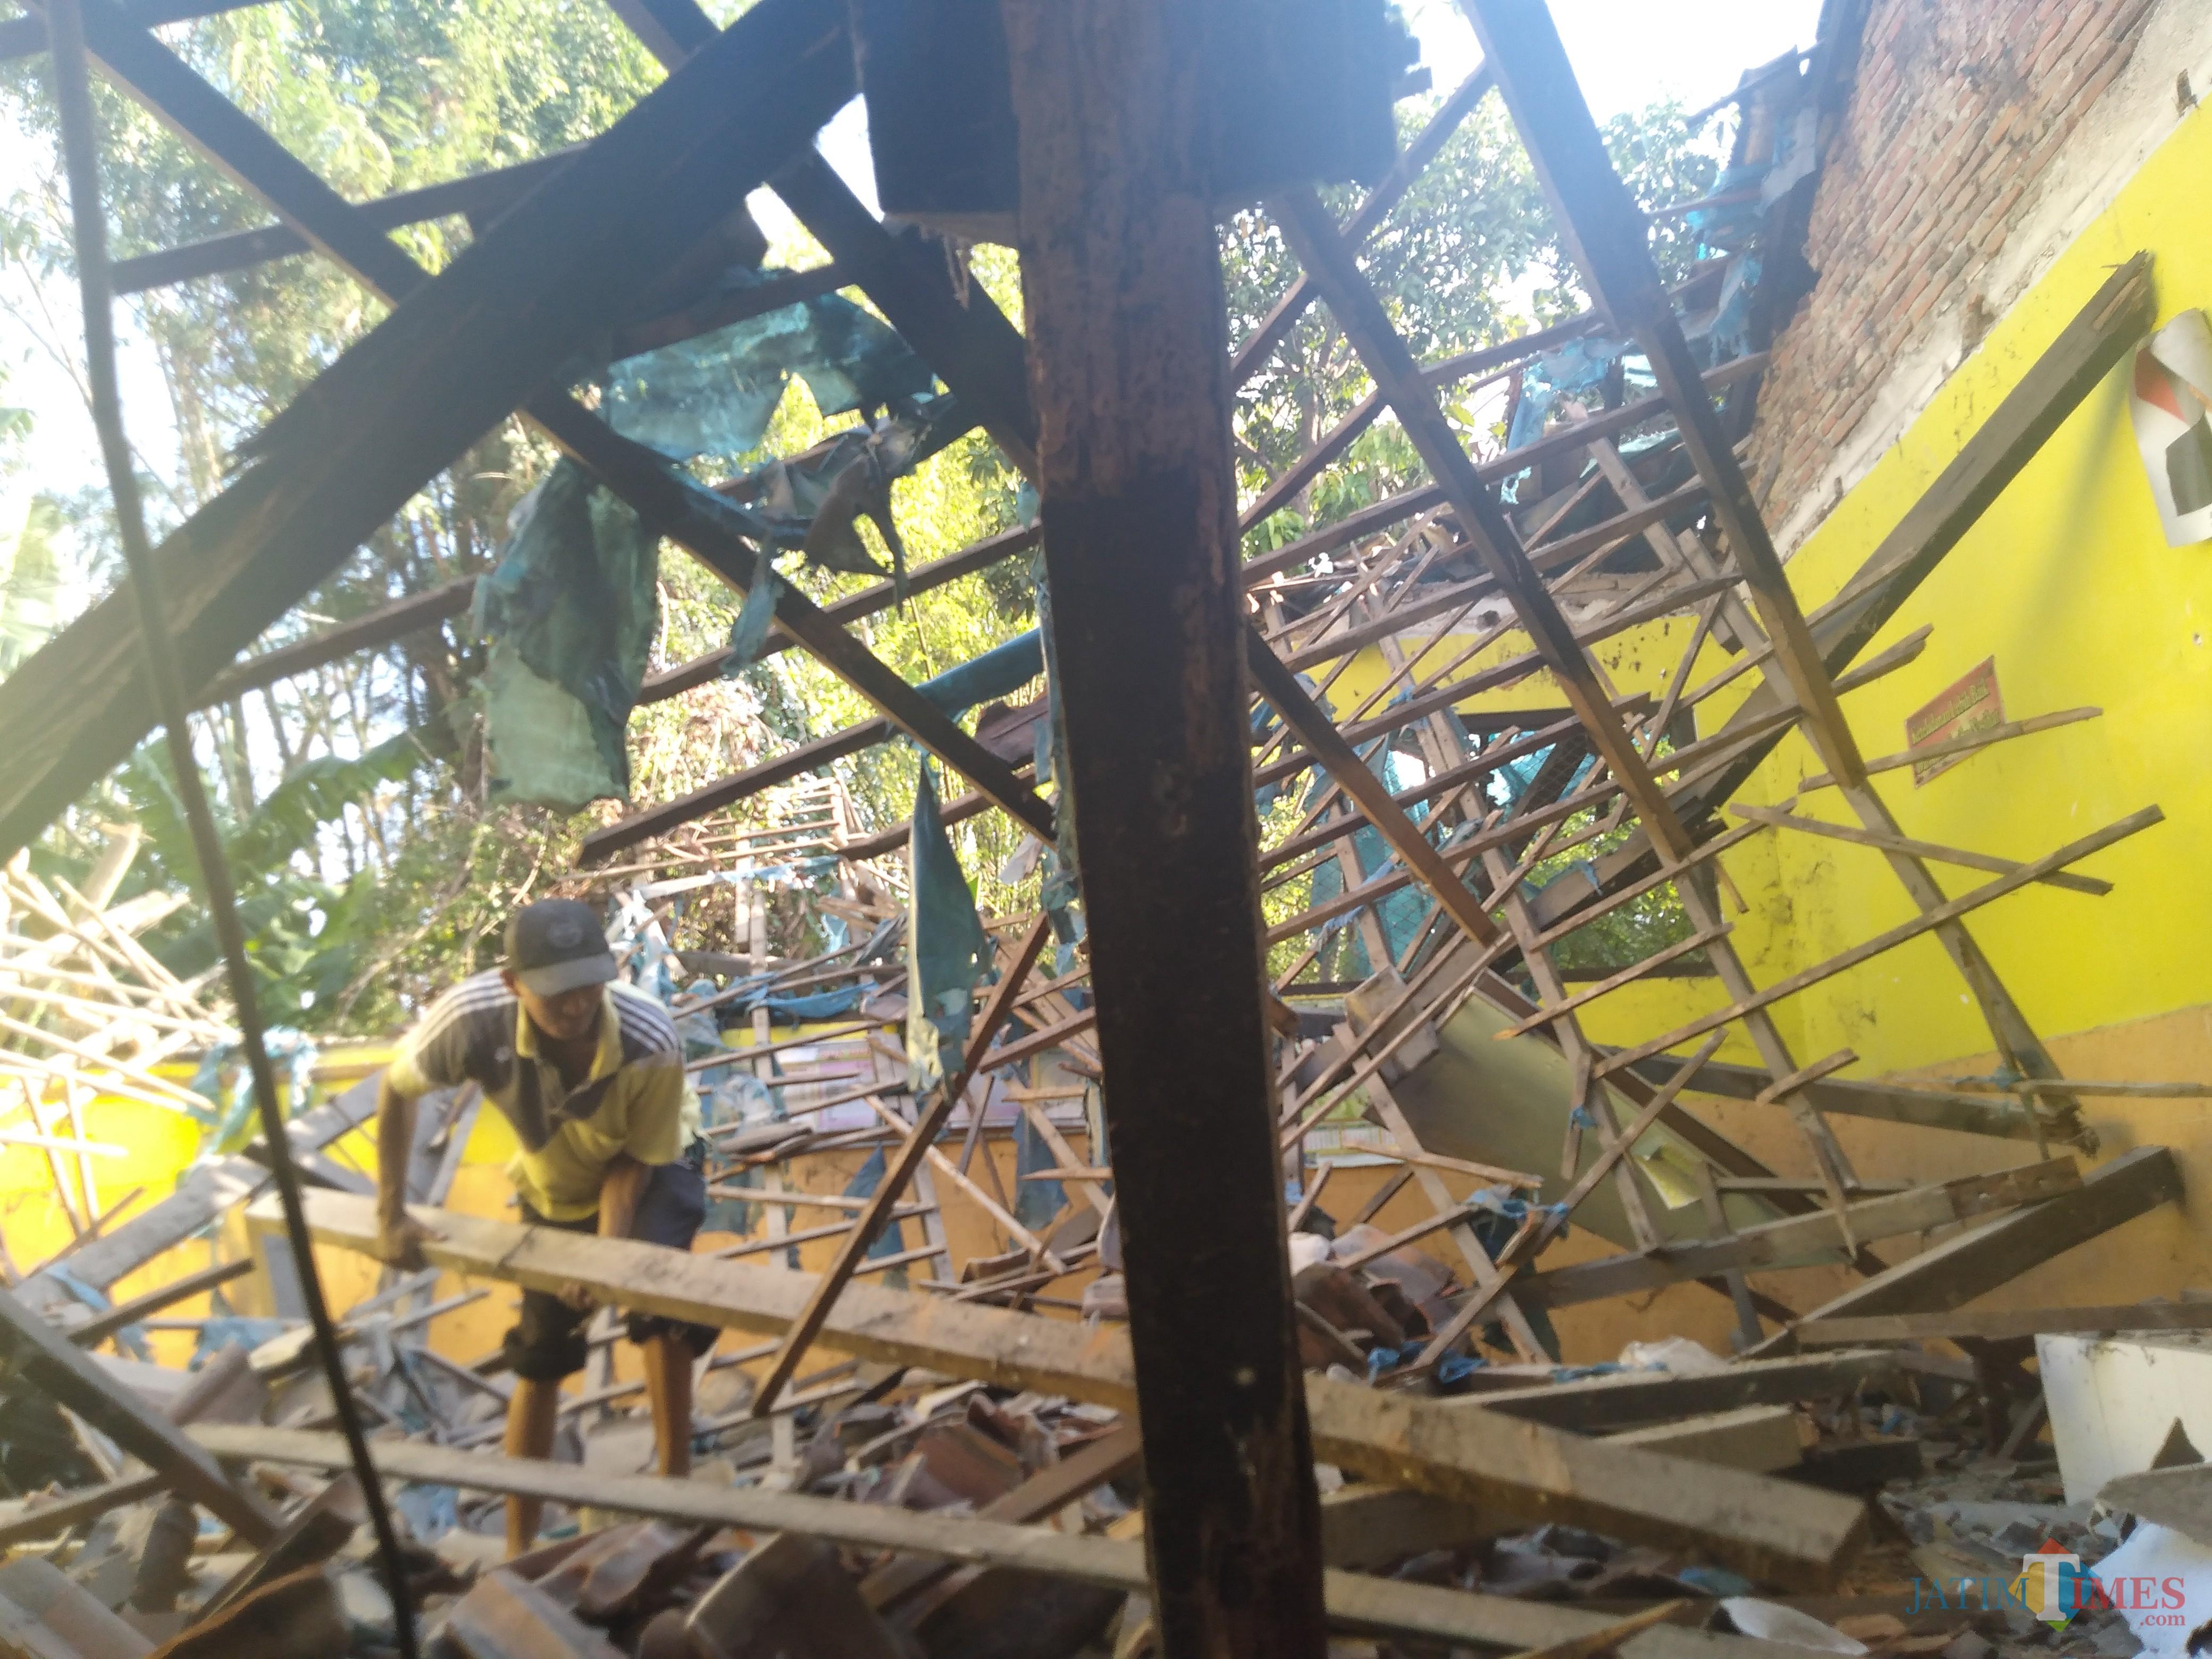 Pegawai SDN Dukuhklopo, Kecamatan Peterongan, Jombang terlihat membersihkan puing-puing runtuhan atap kelas. (Foto: Adi Rosul / JombangTIMES)